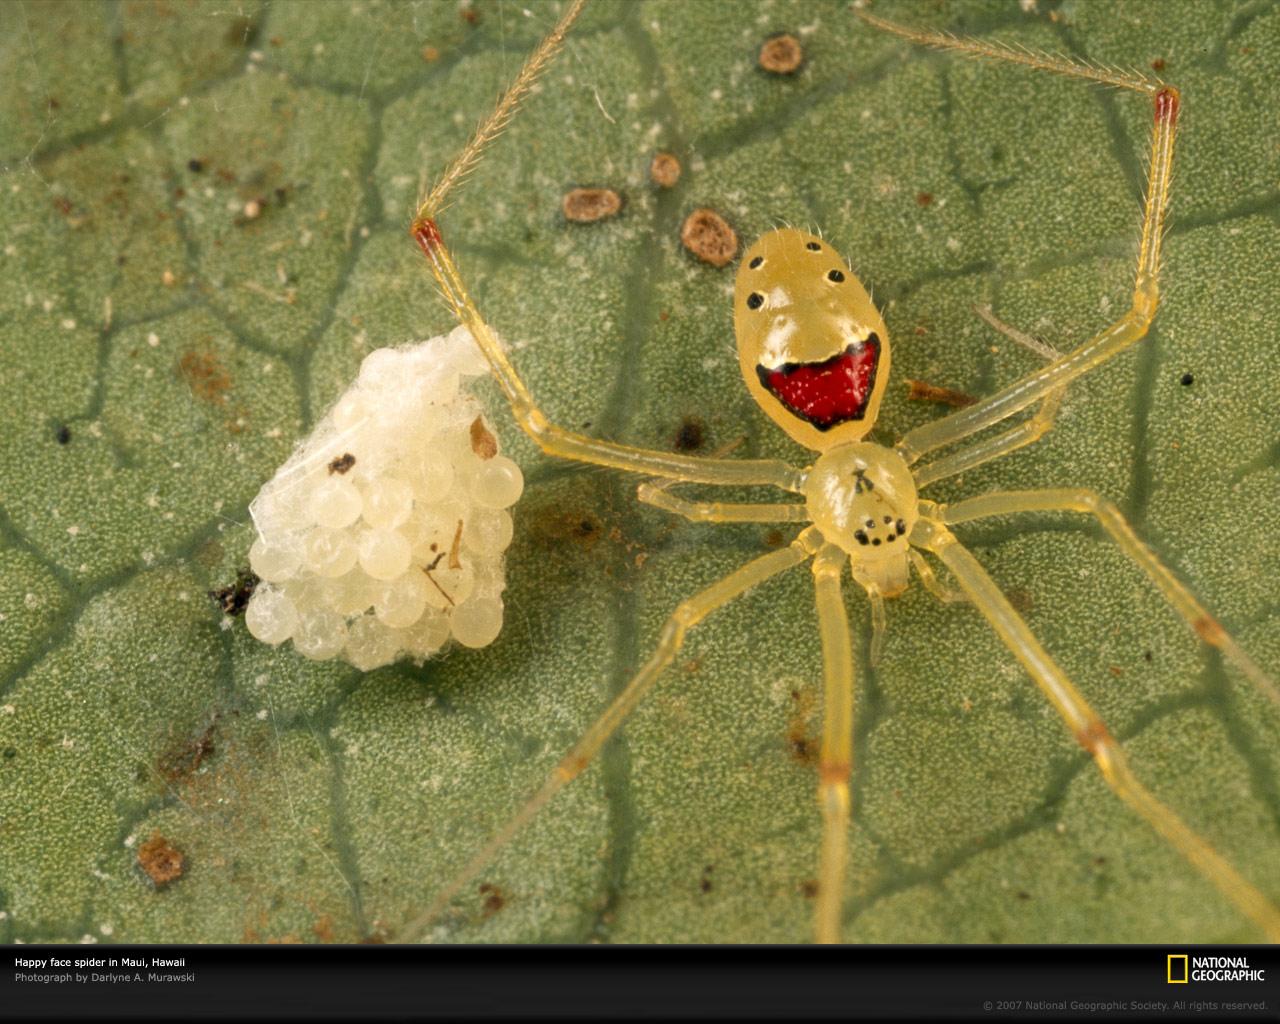 Spider smile